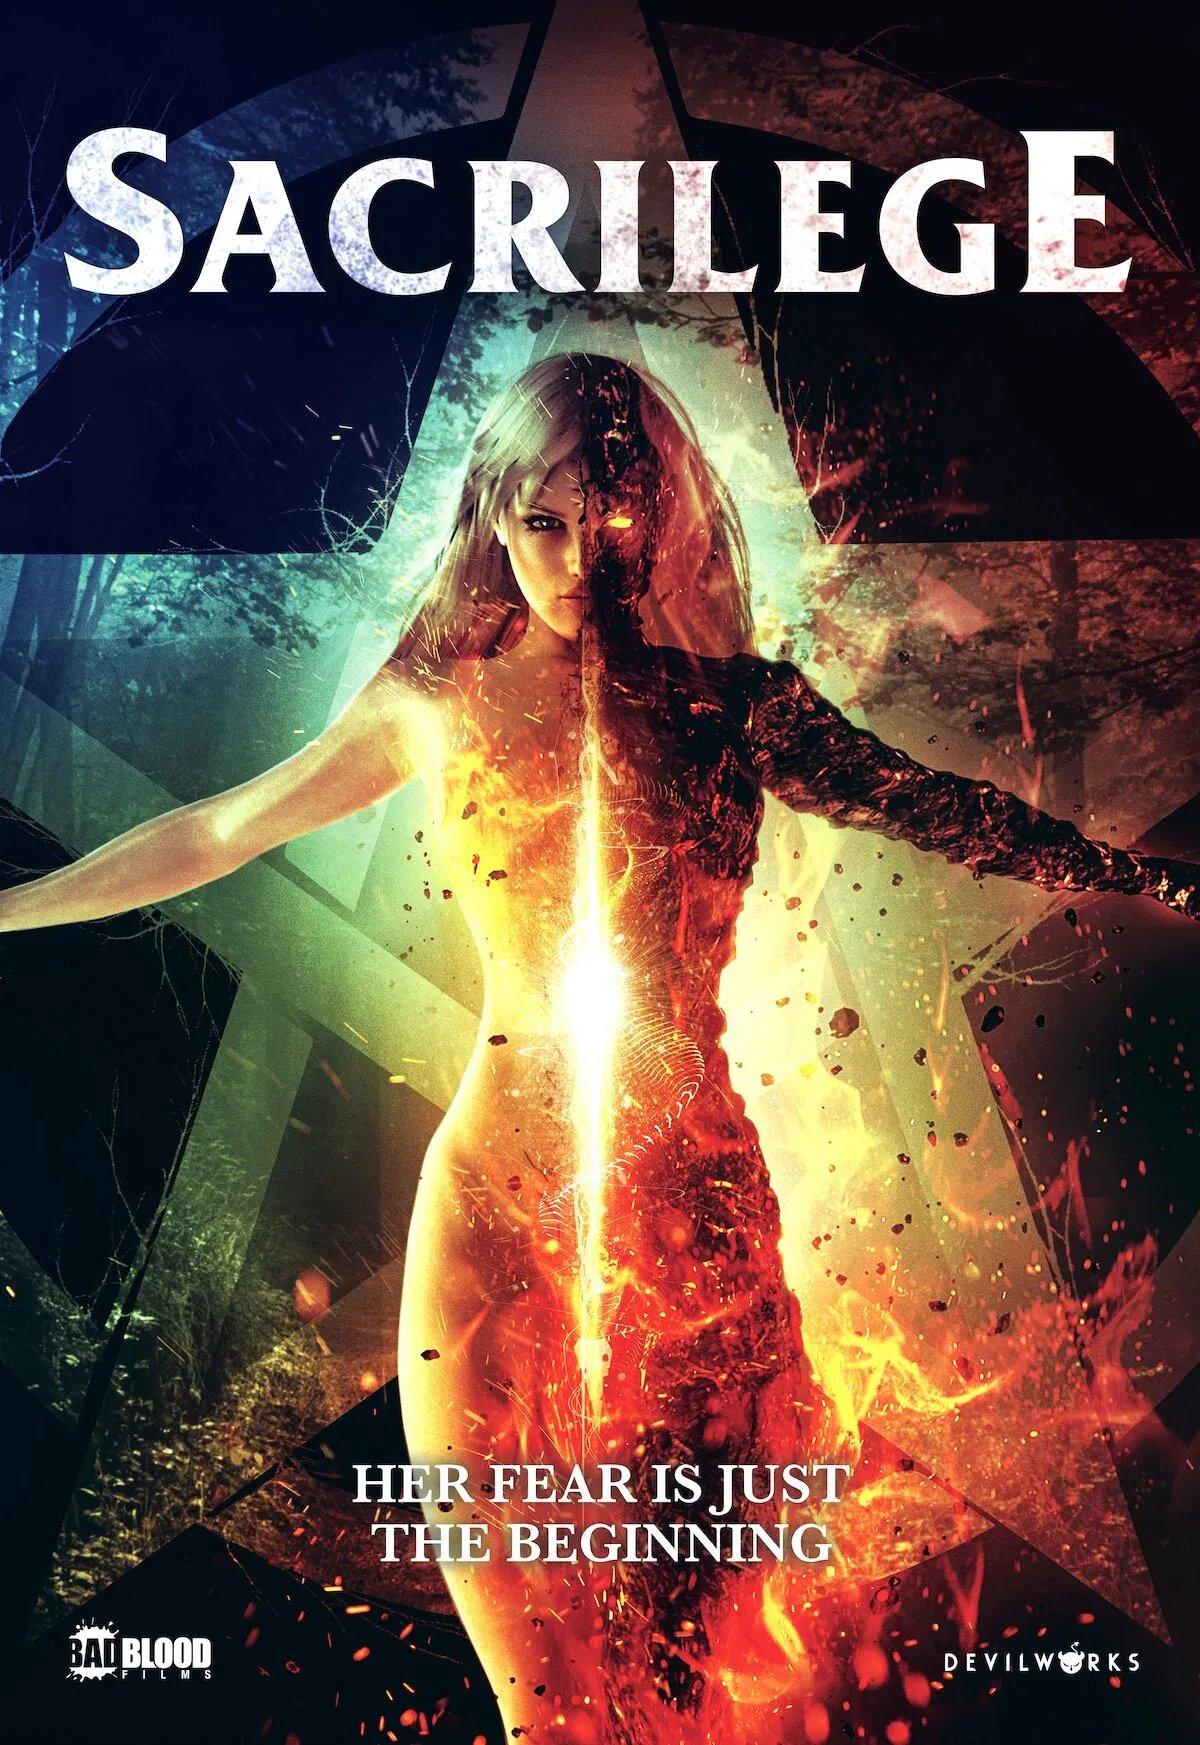 Sacrilege Trailer & Poster 1